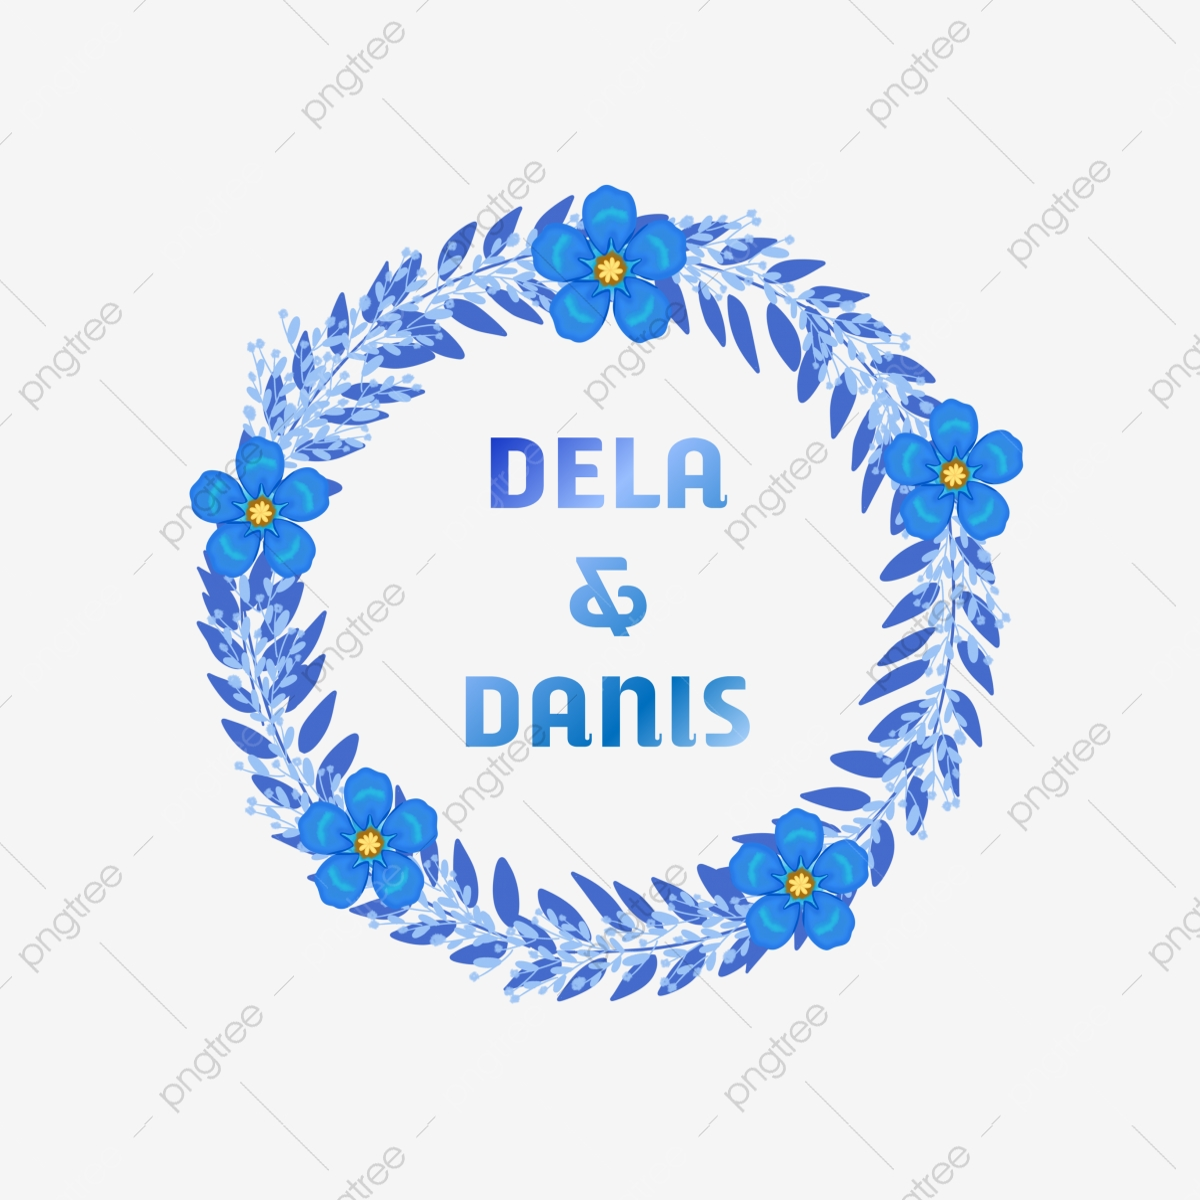 Simple Blue Rose Wedding Flower Bunga Rancangan Menanam Png Transparent Clipart Image And Psd File For Free Download